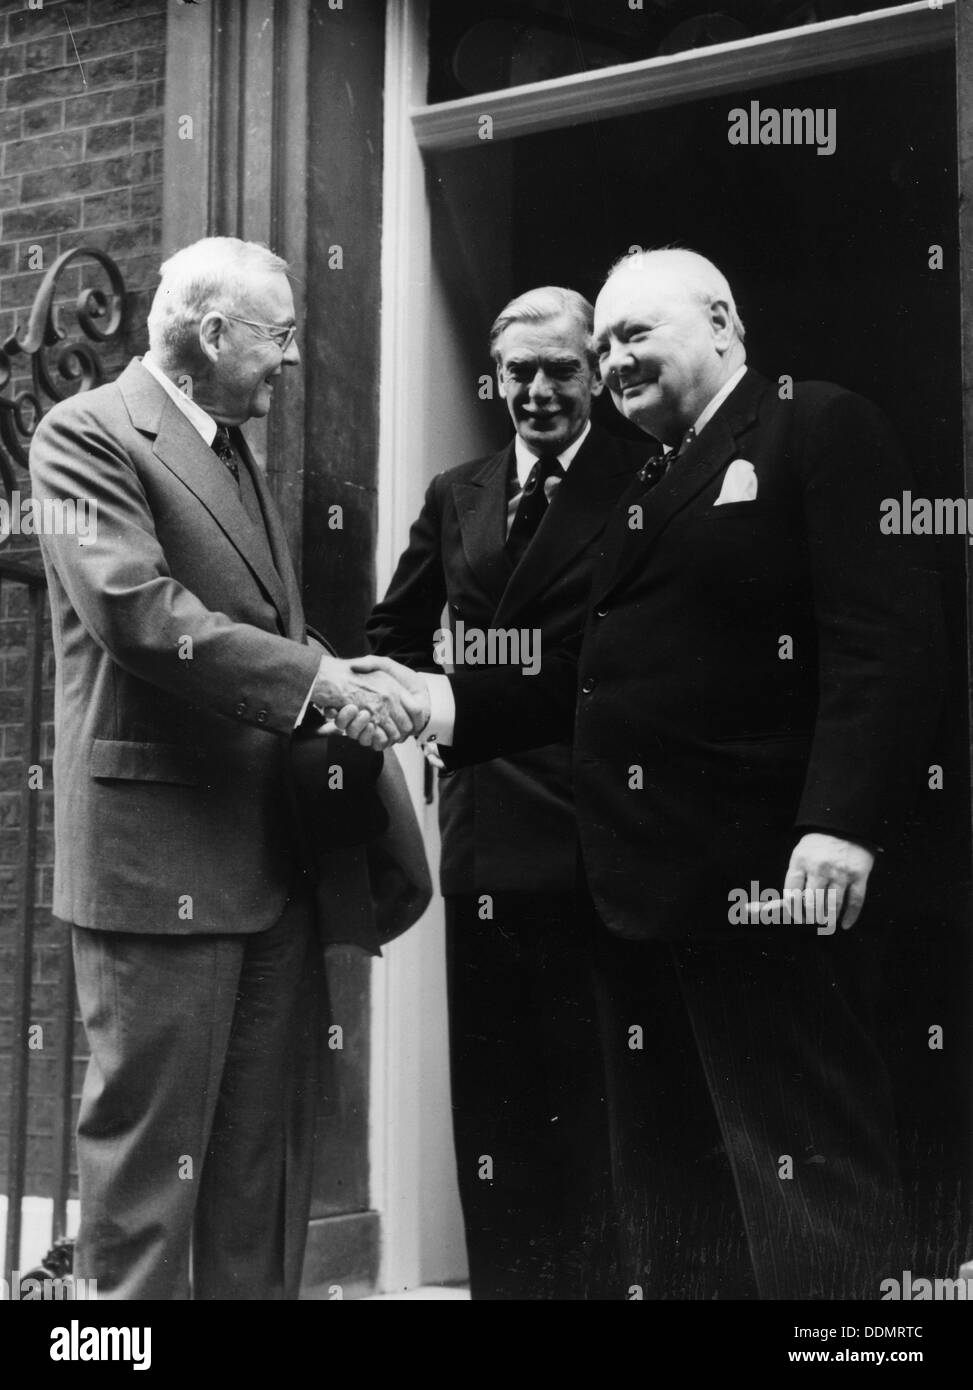 Sir Winston Churchill (1874-1965), John Foster Dulles (US Sec of State), Anthony Eden, c1952. - Stock Image